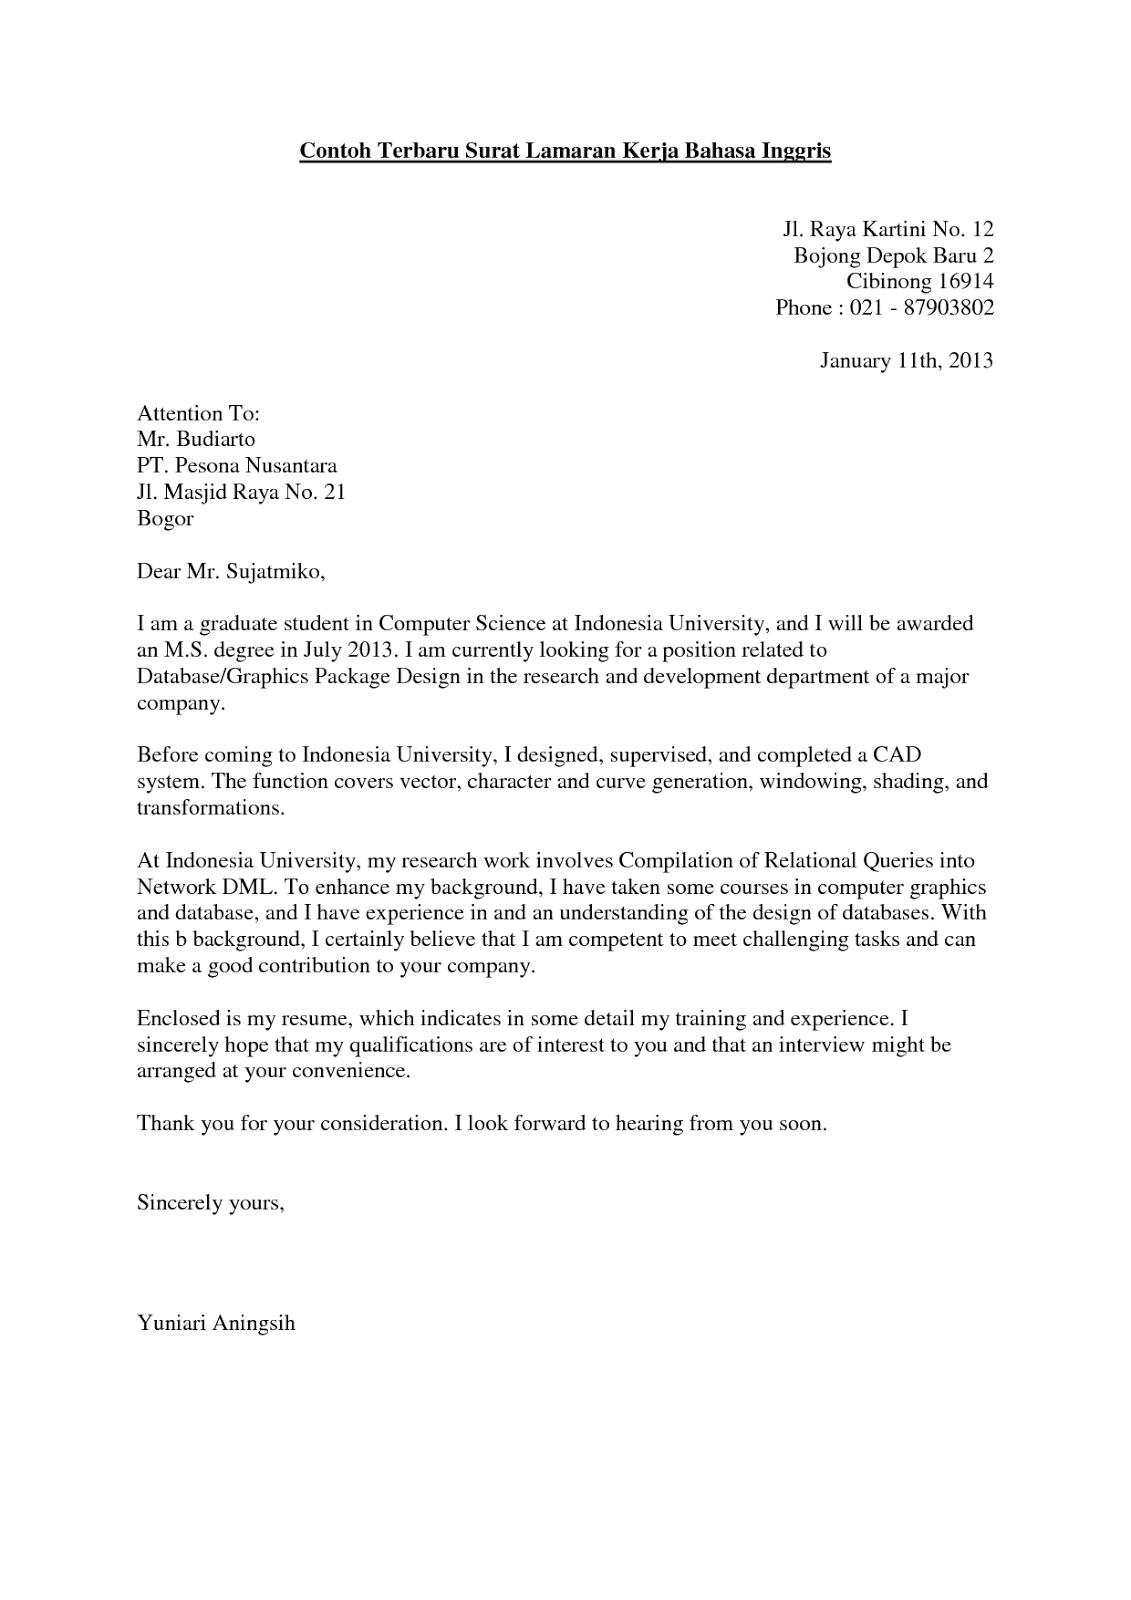 Ben Jobs Contoh Surat Lamaran Kerja Bahasa Inggris Fresh Graduate